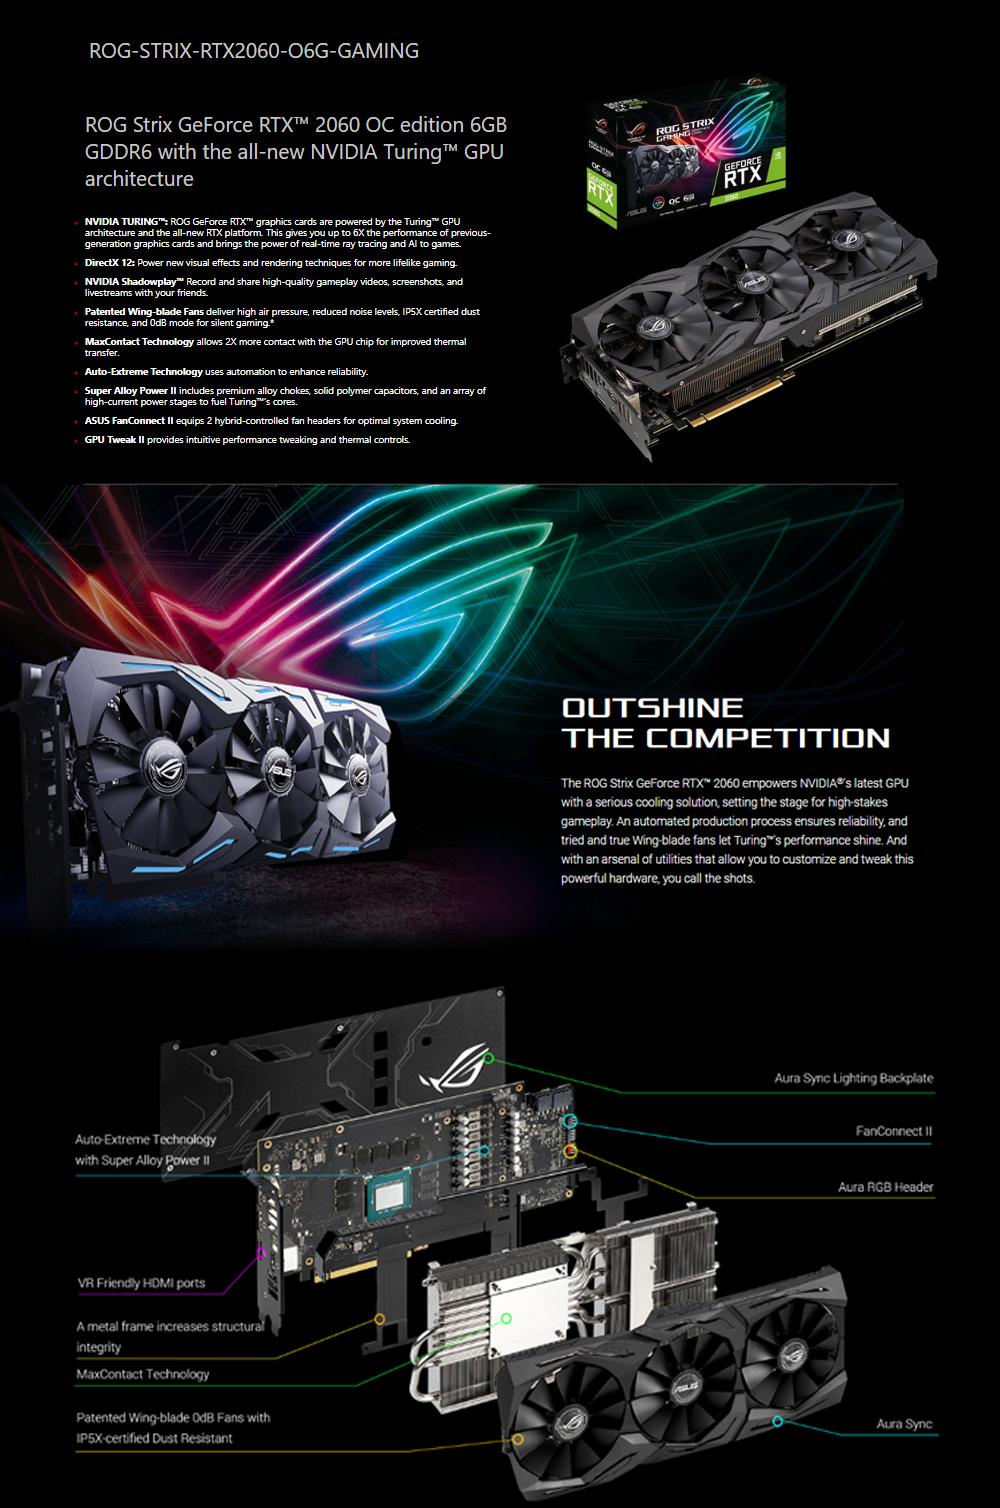 Asus ROG Strix GeForce RTX™ 2060 OC edition 6GB GDDR6 Video